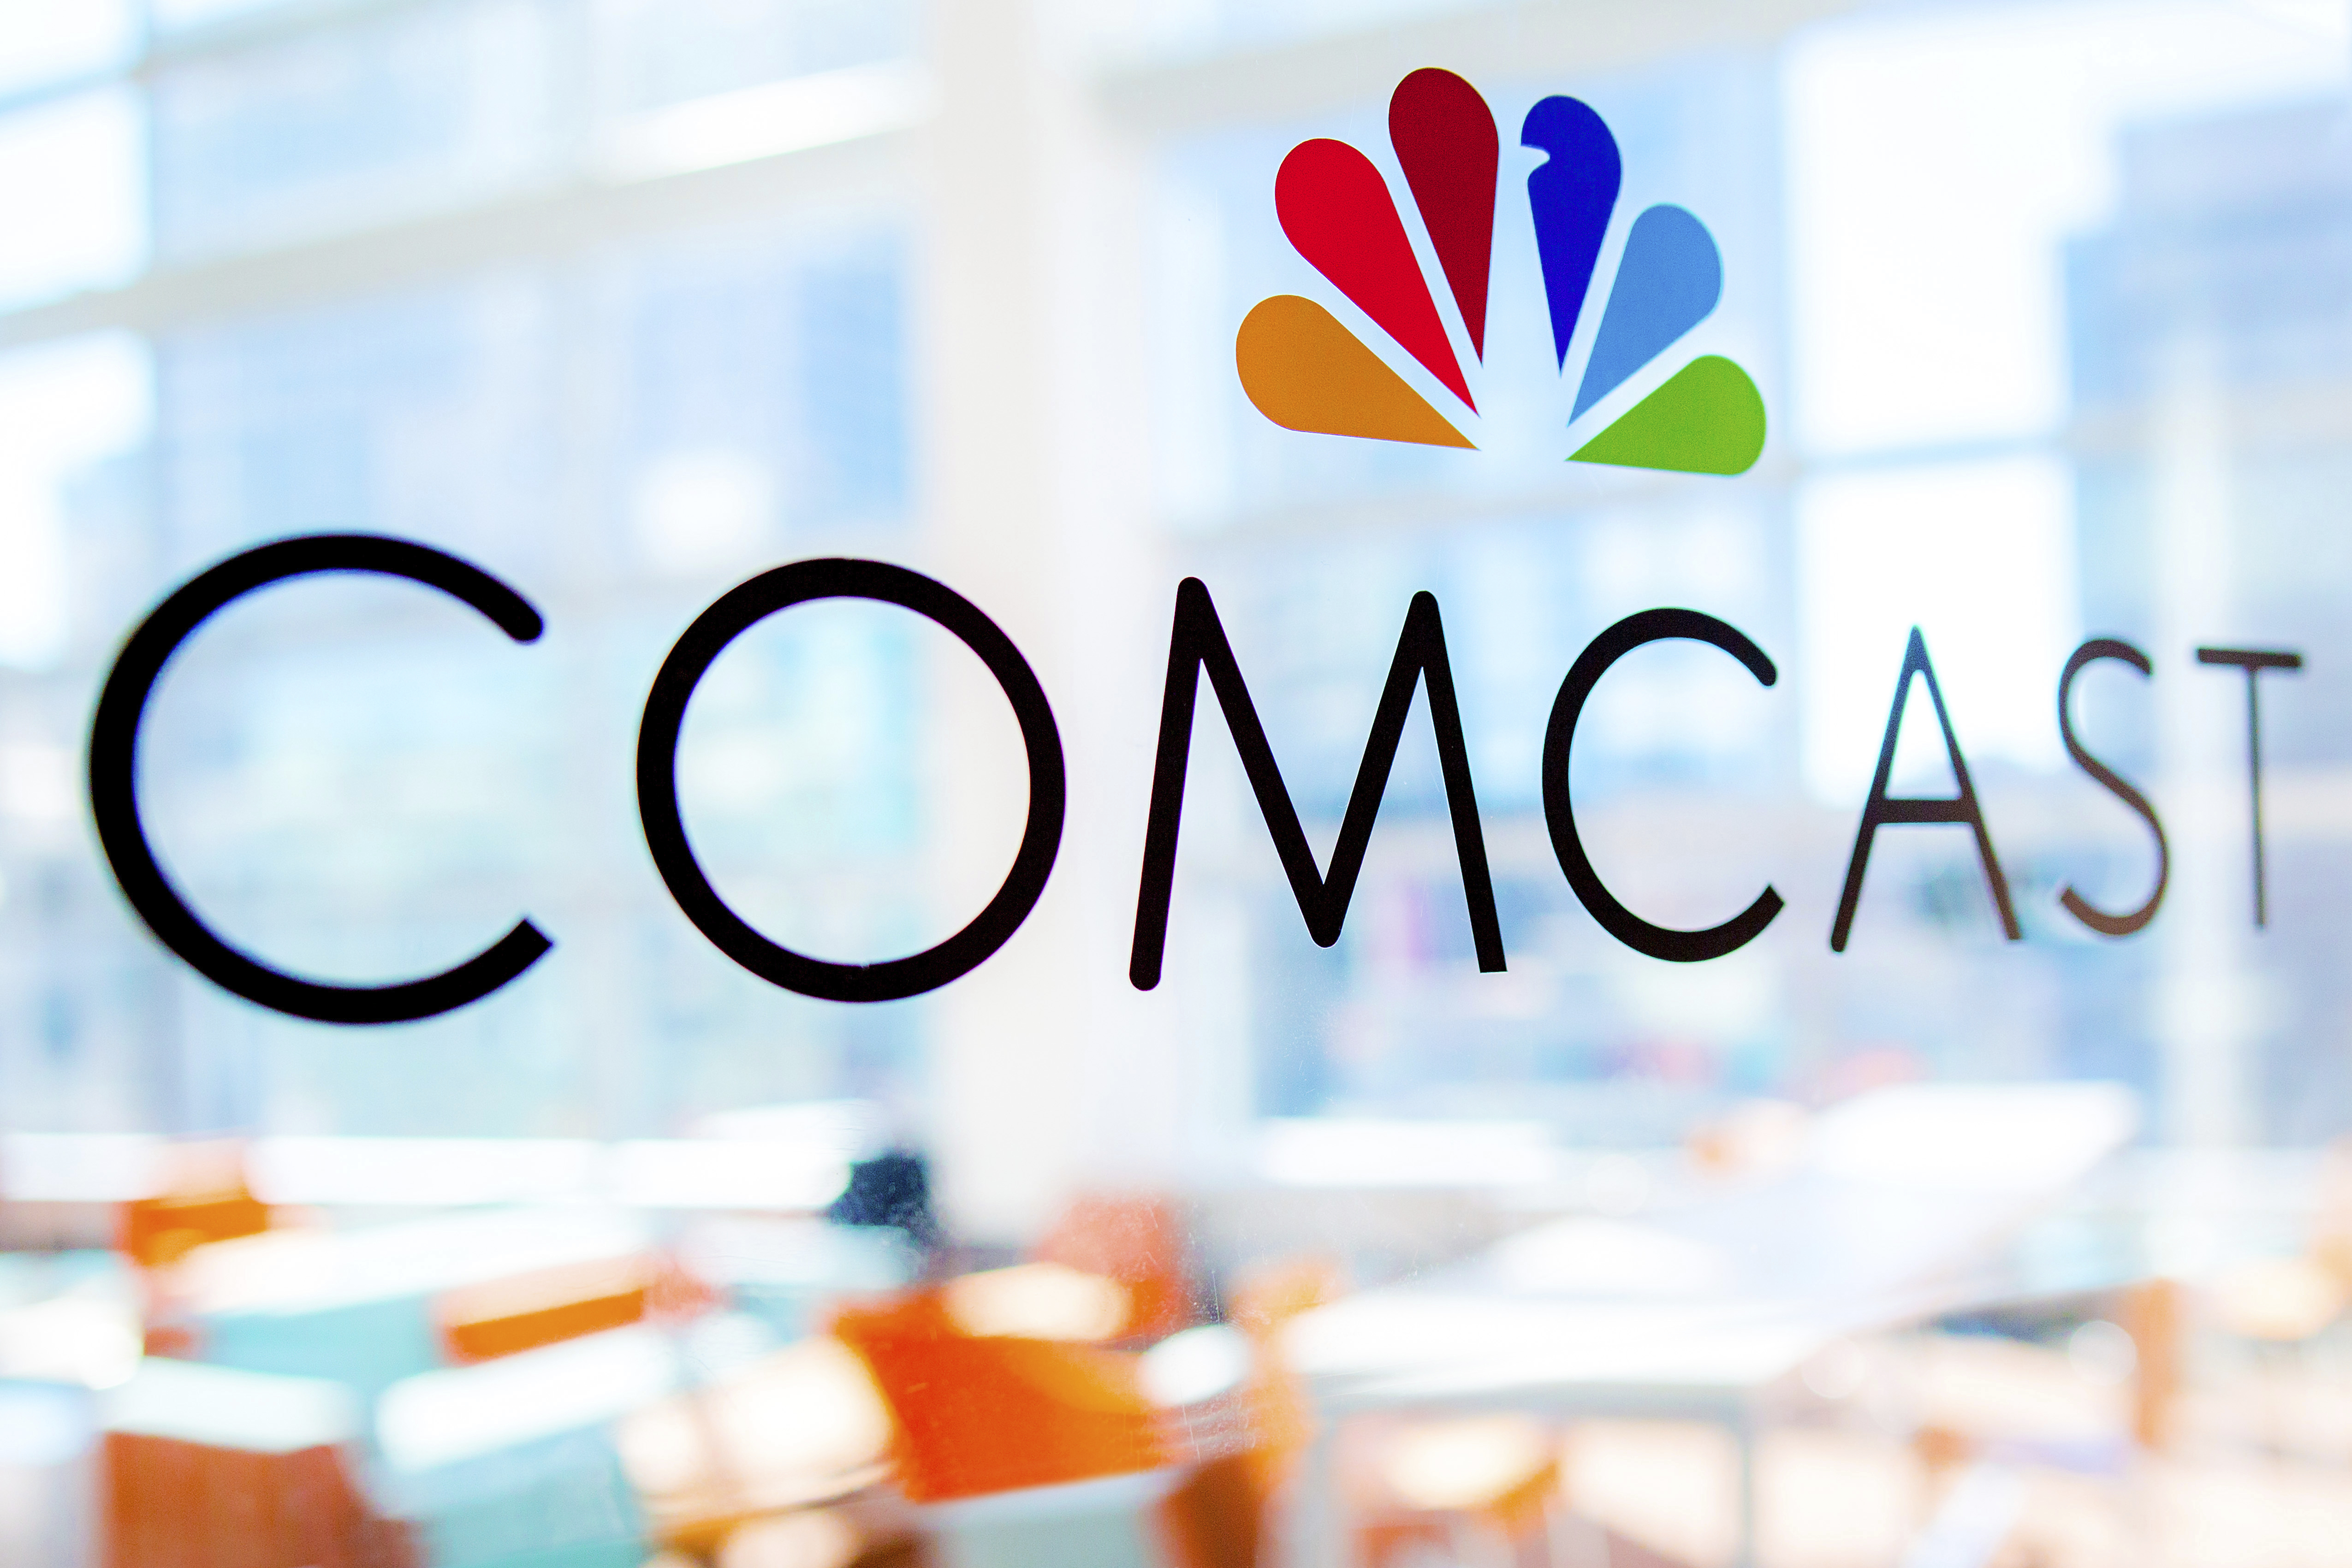 washingtonpost.com - Brian Fung - Small cable companies want DOJ to reinvestigate Comcast's merger with NBC